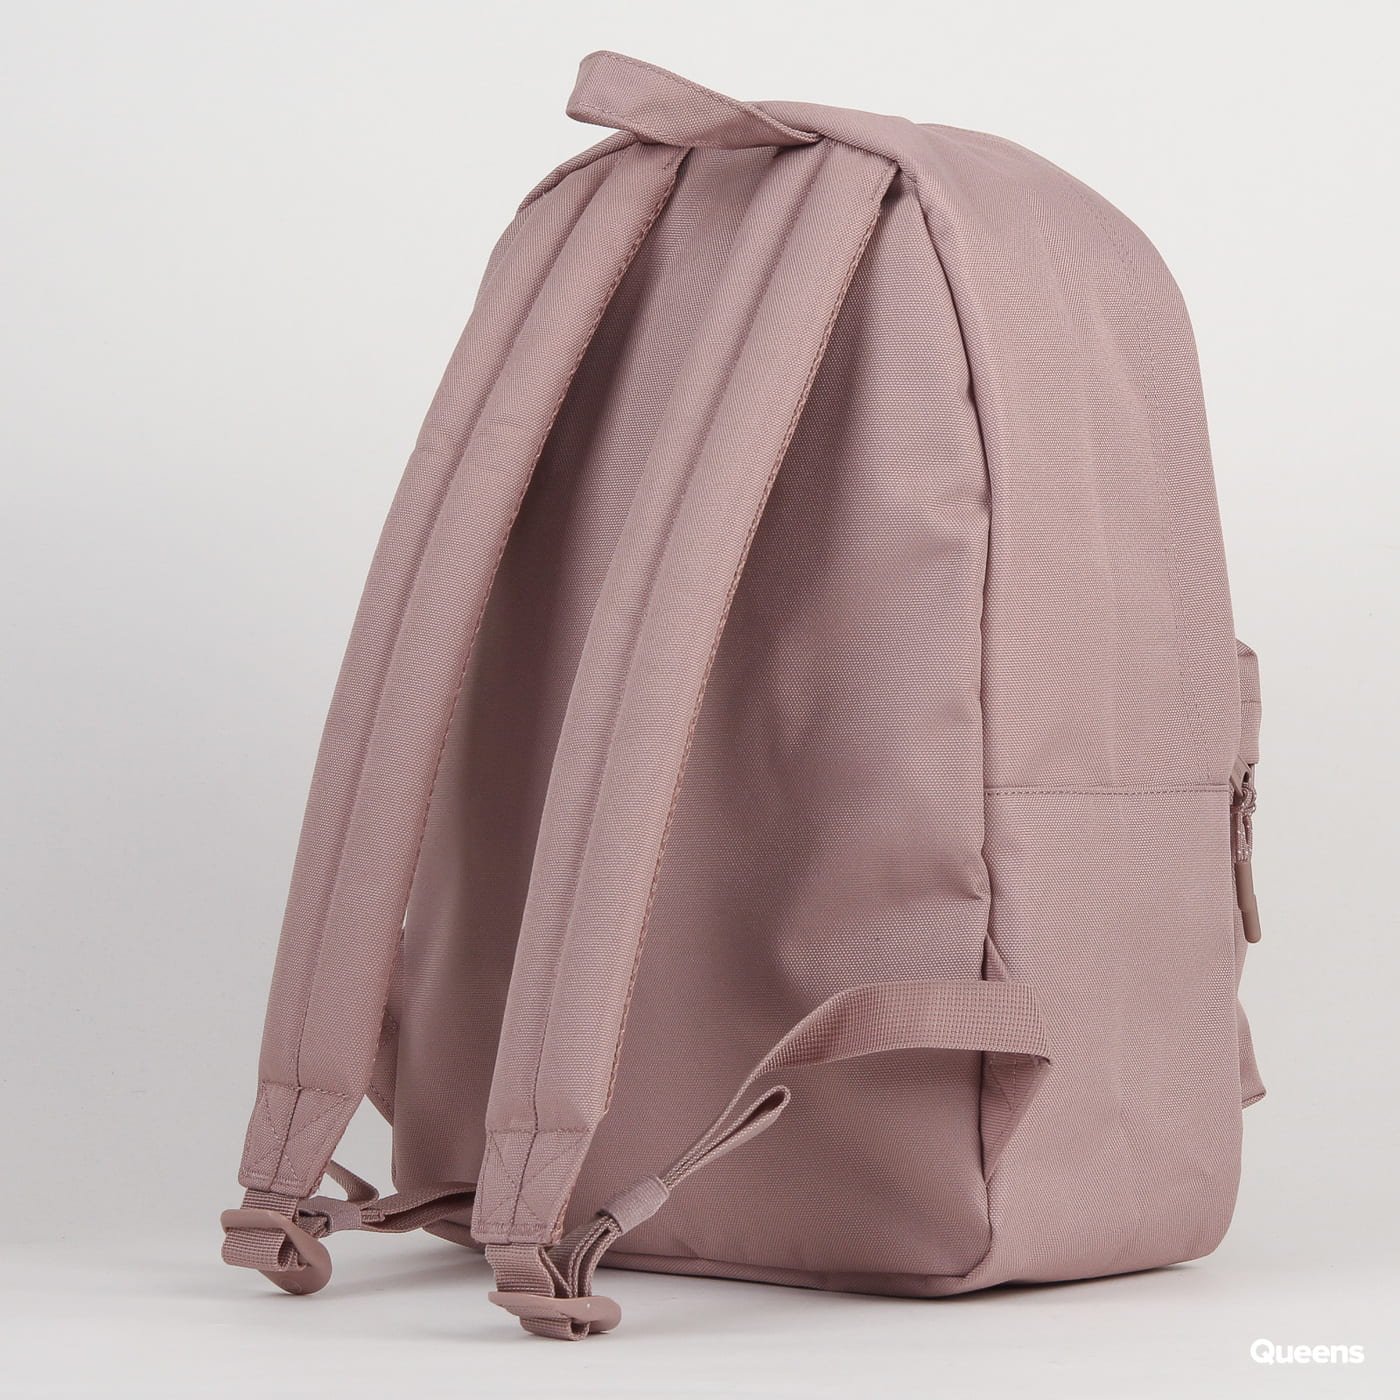 The Herschel Supply CO. Classic Backpack light purple